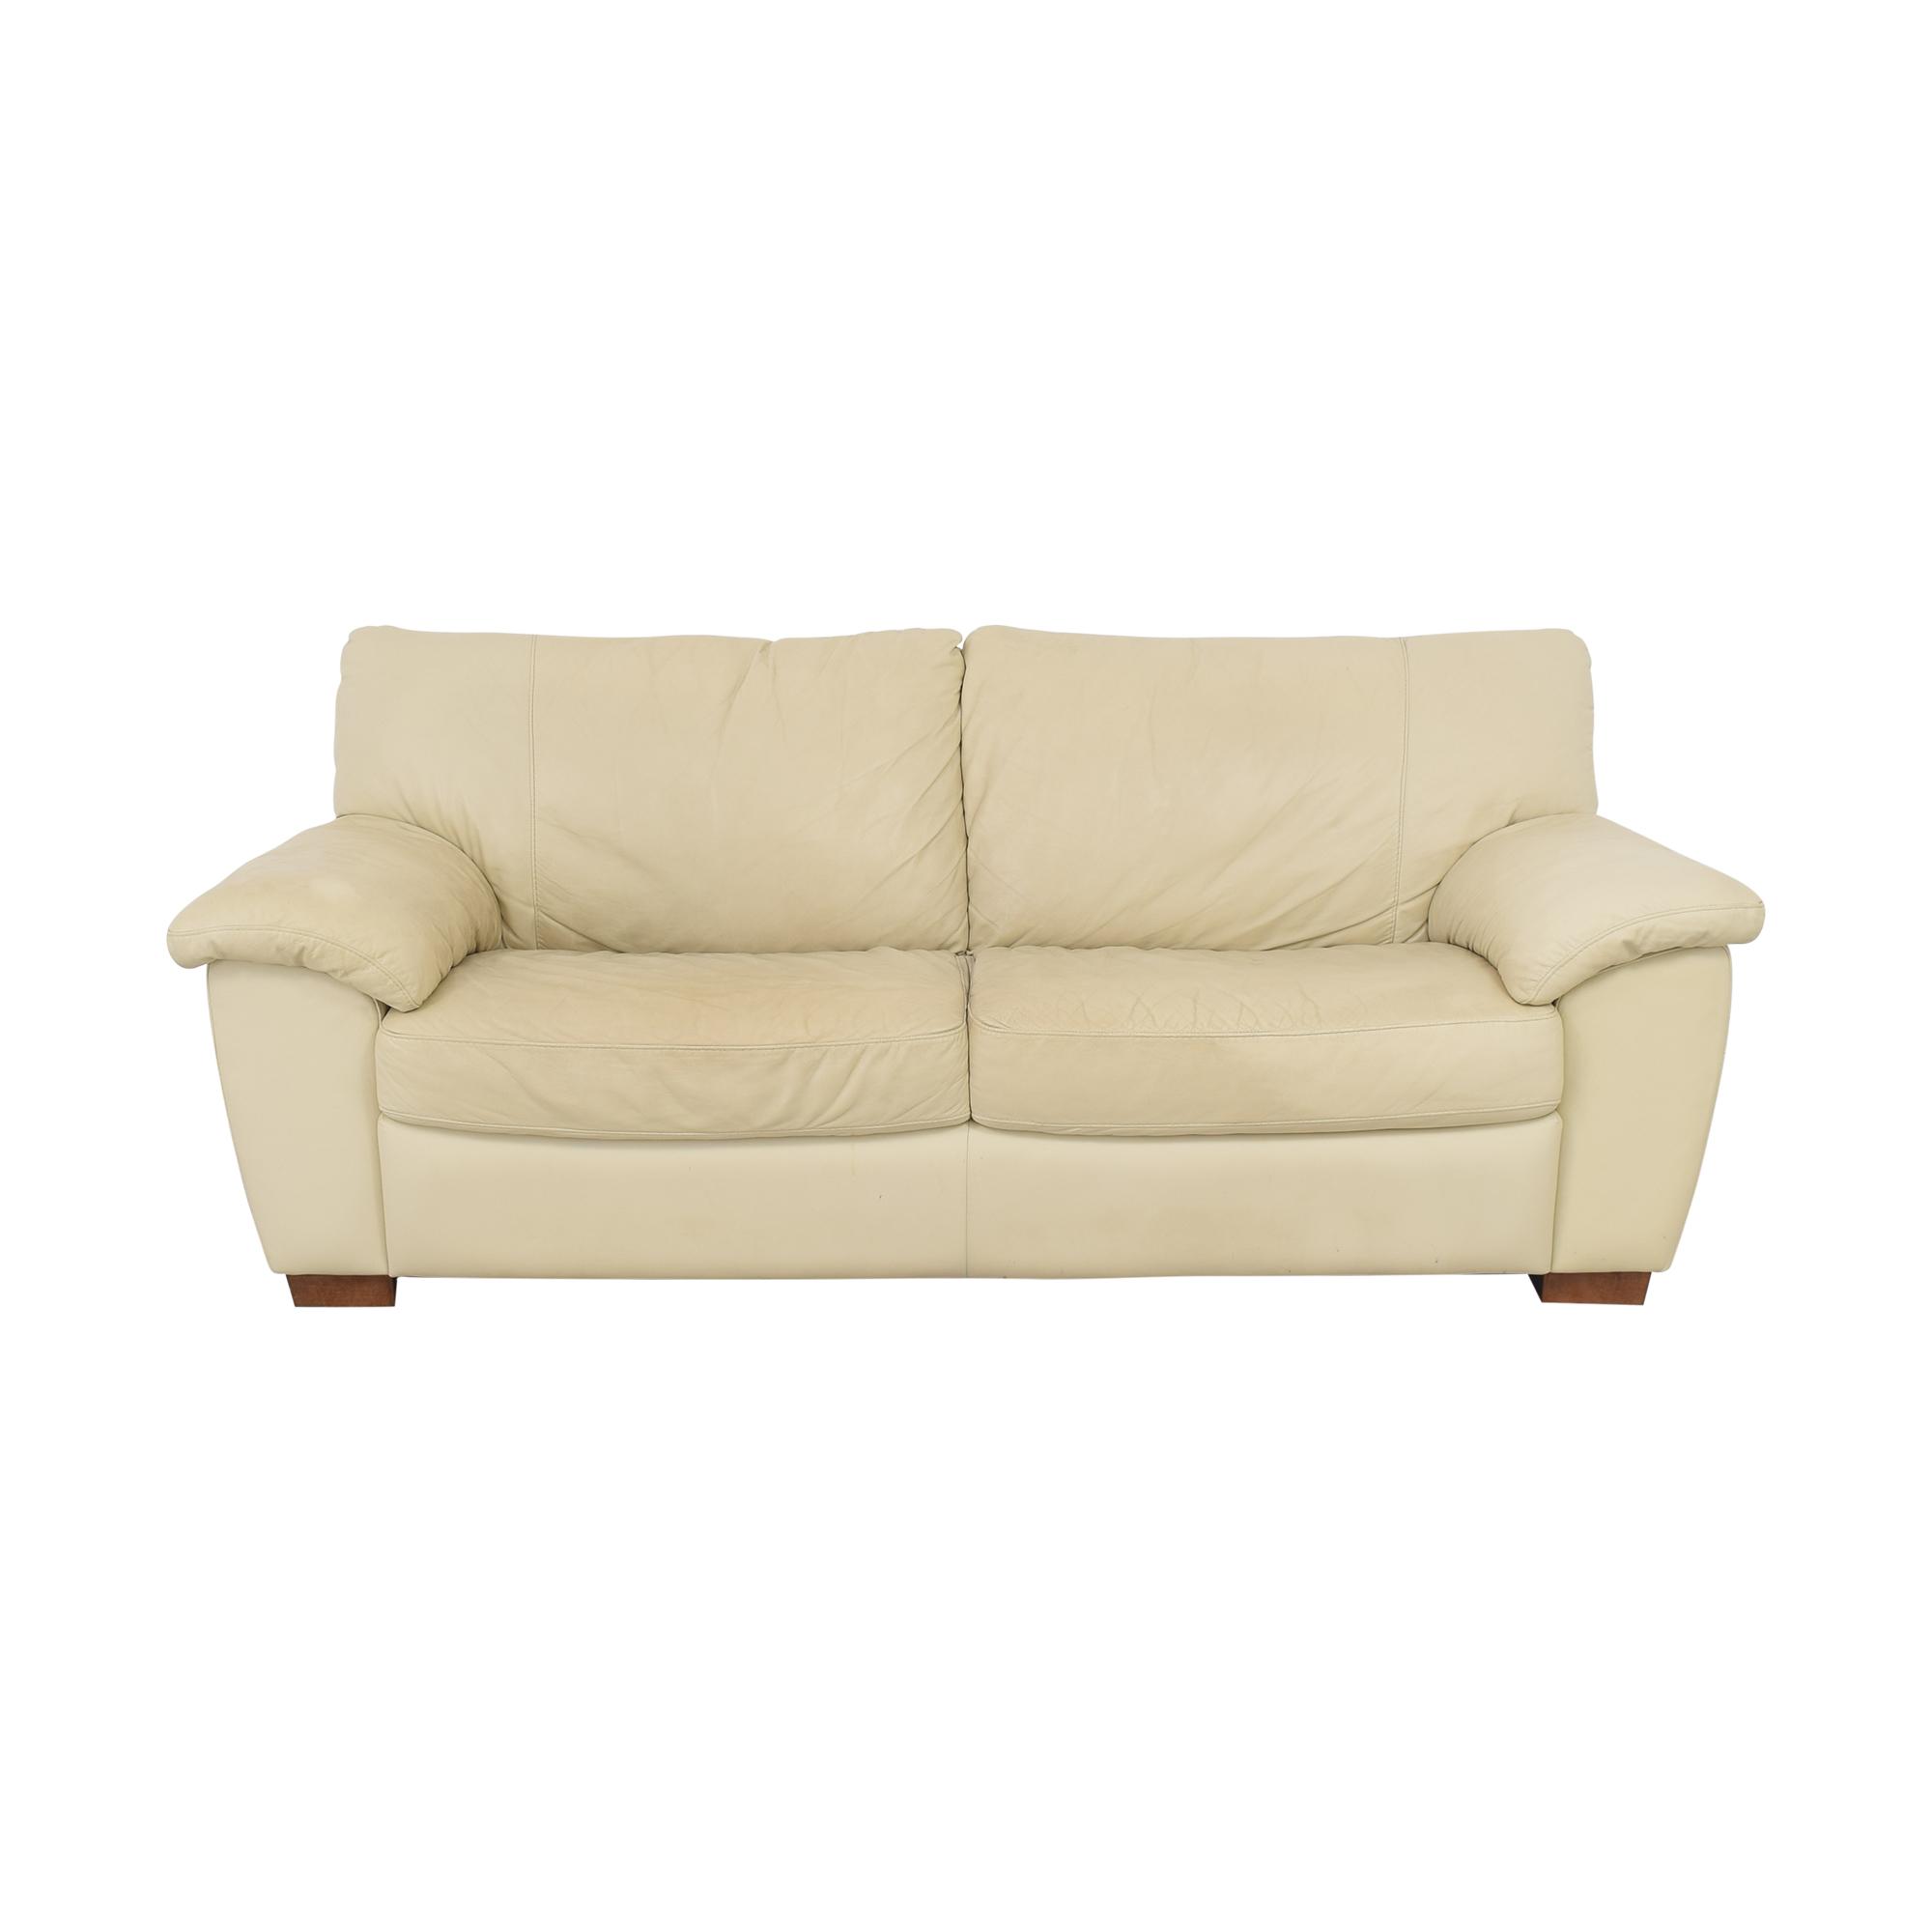 IKEA IKEA Vreta Sofa Sofas